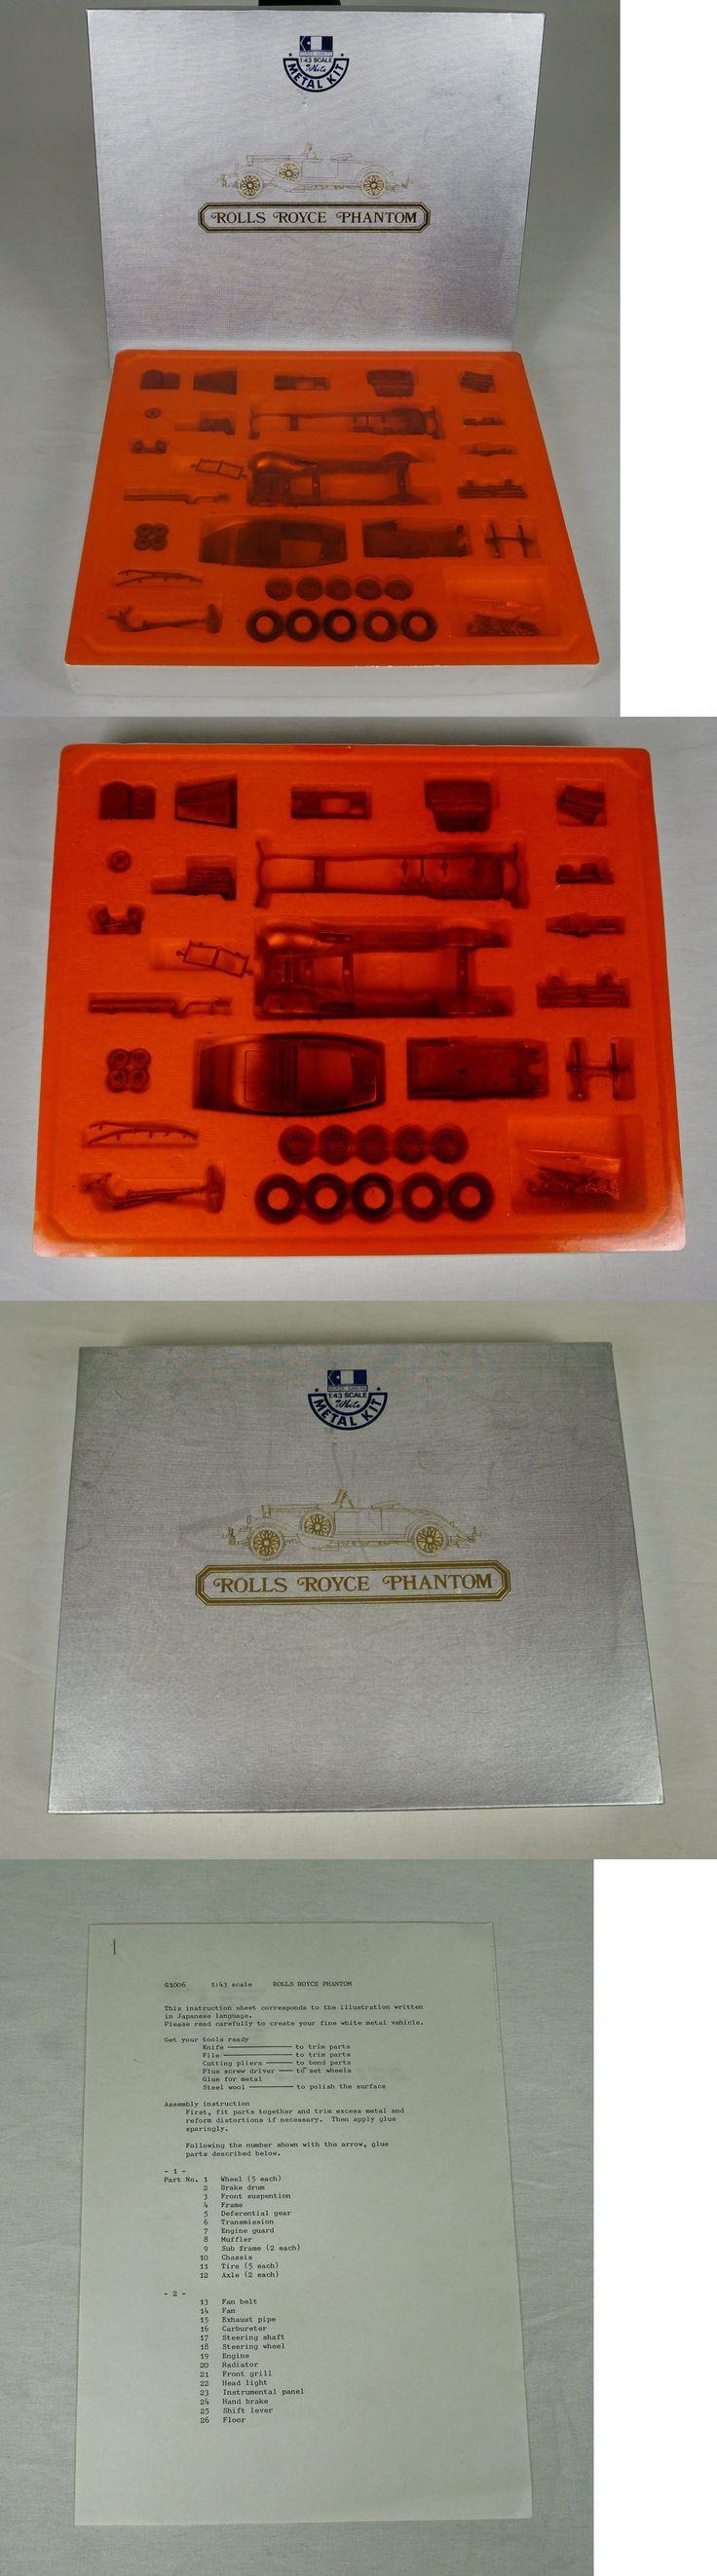 Other Sports Car Models and Kits 2583: Vintage Gunze Sangyo Rolls Royce Phantom White Metal Kit Sealed! 1 43 -> BUY IT NOW ONLY: $94.95 on eBay!